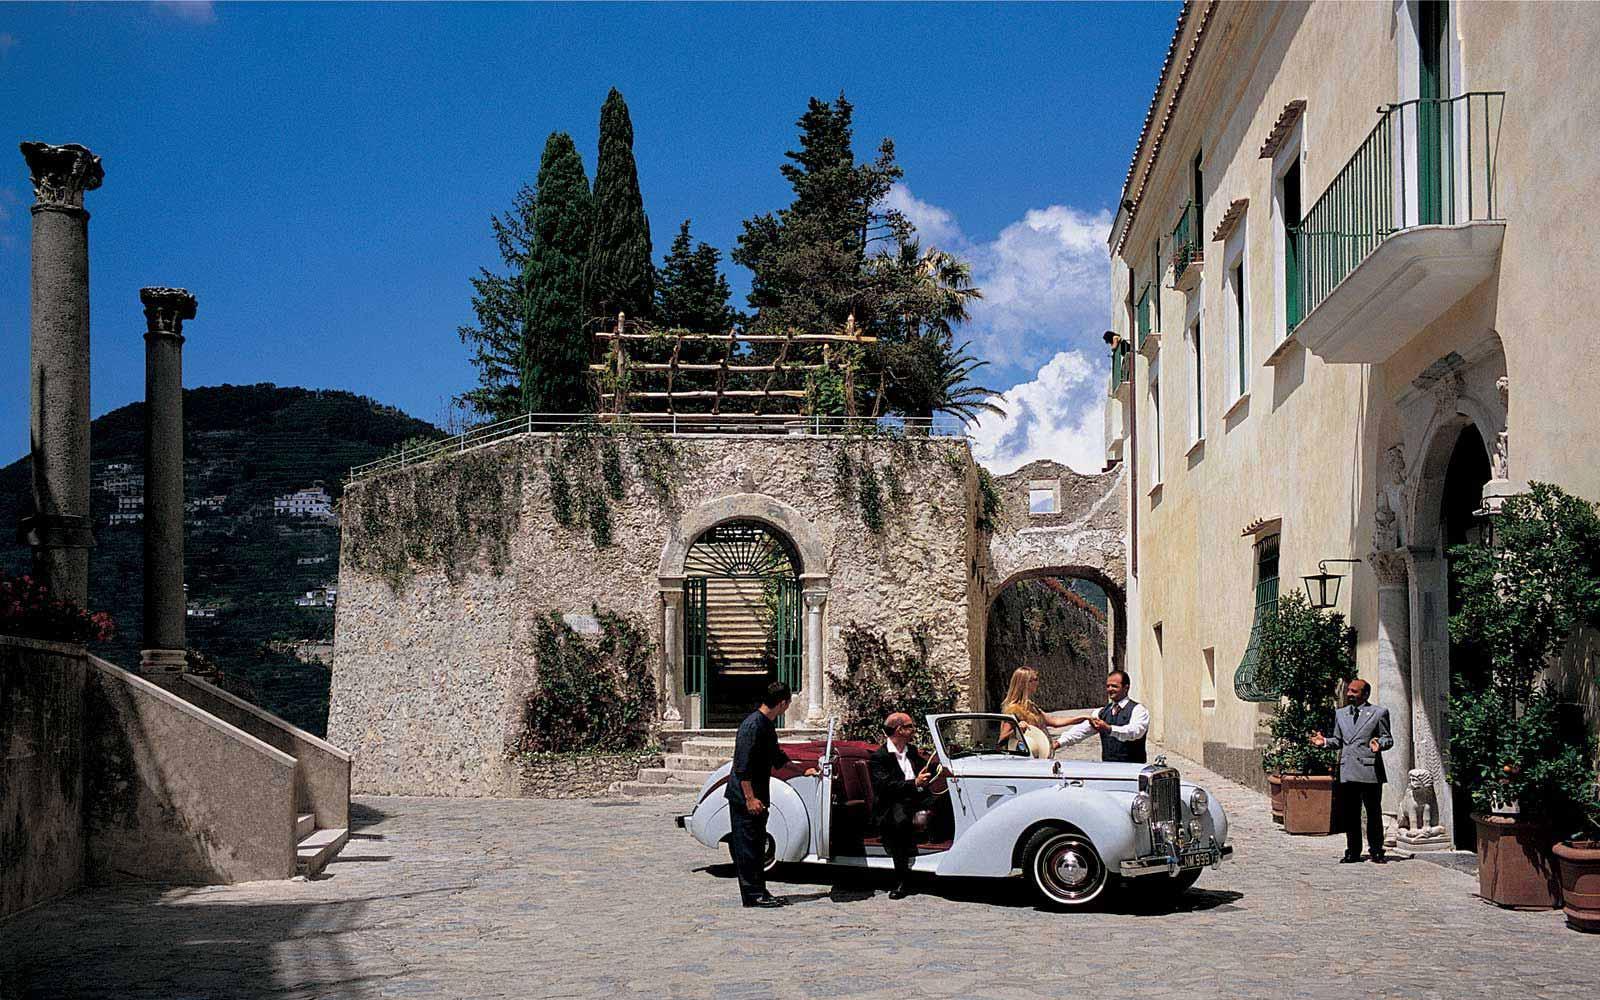 Entrance to Belmond Hotel Caruso